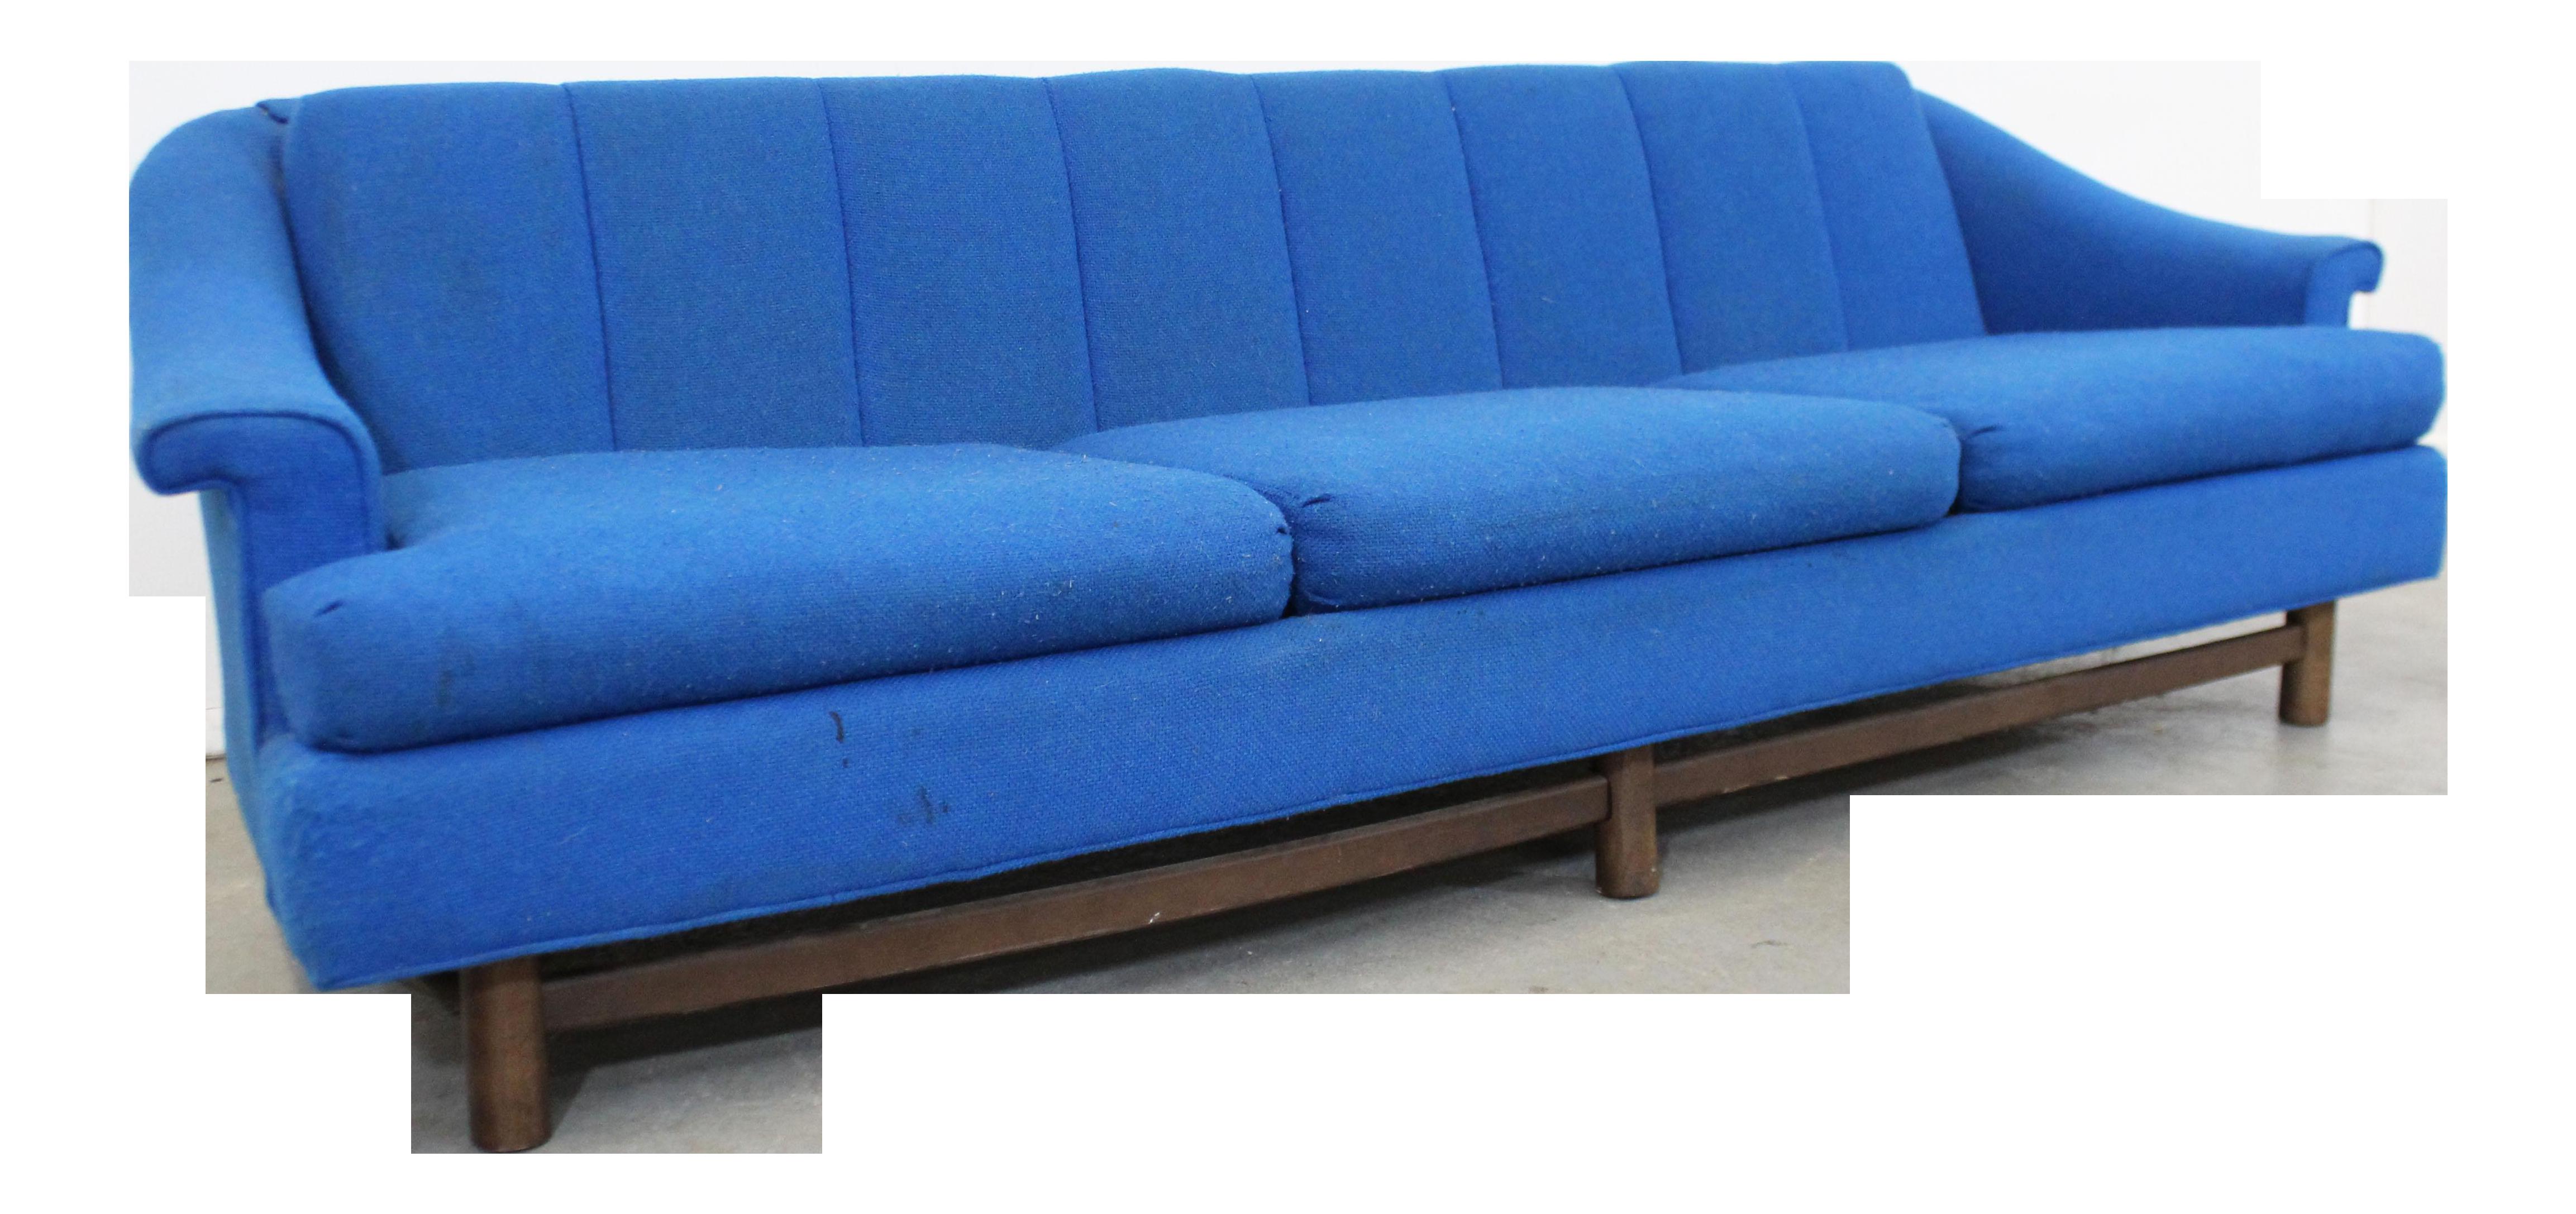 Mid Century Danish Modern Blue 3 Seater Sofa On Wood Base